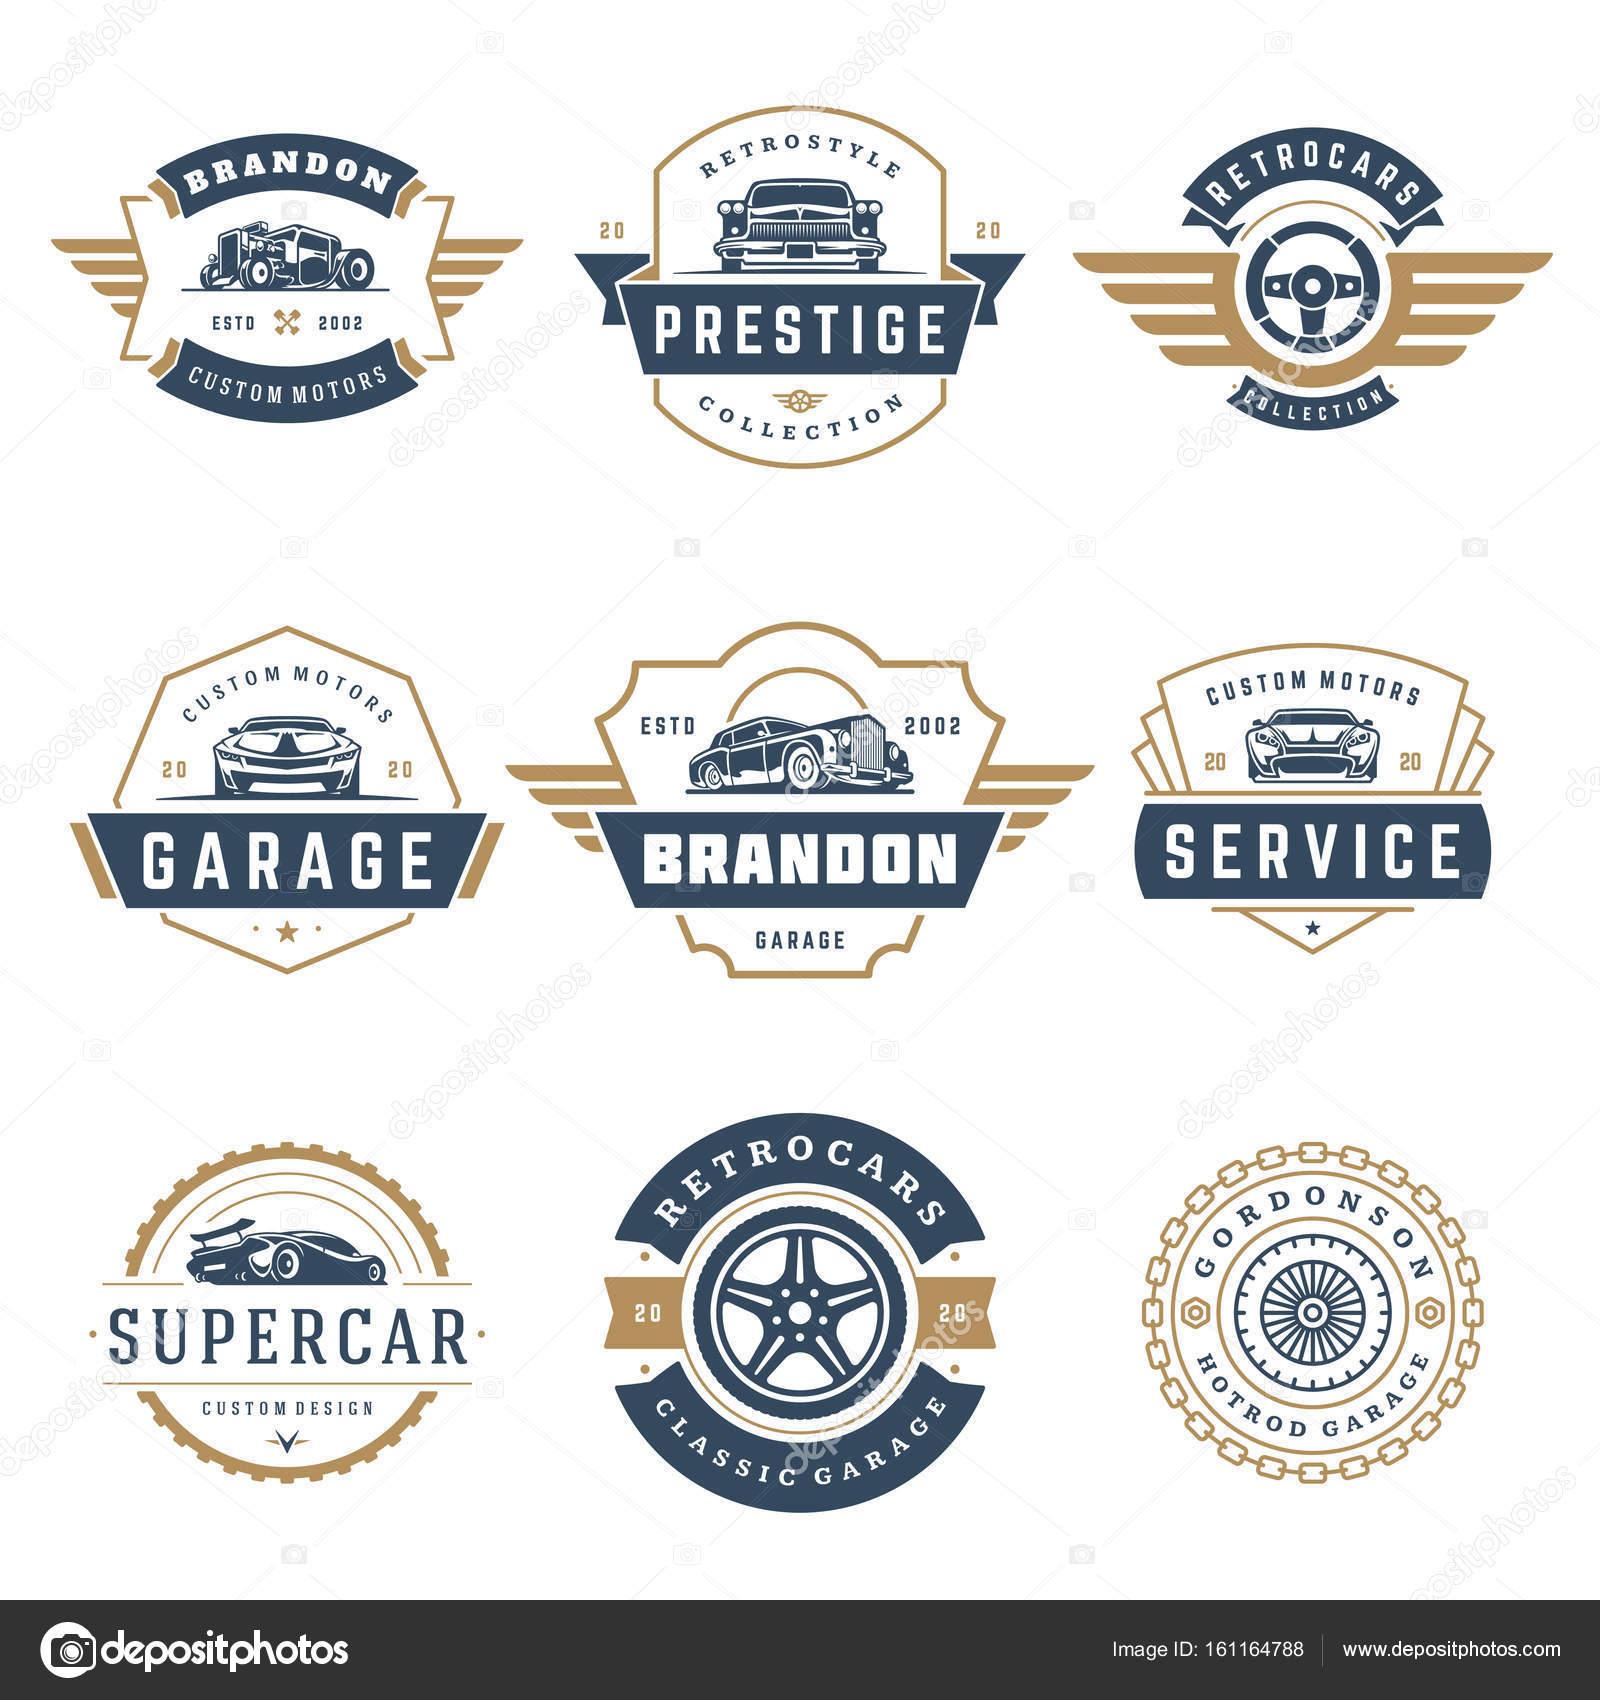 Auto Logos Vorlagen Vektor Elemente Designset, Vintage-Stil-Embleme ...